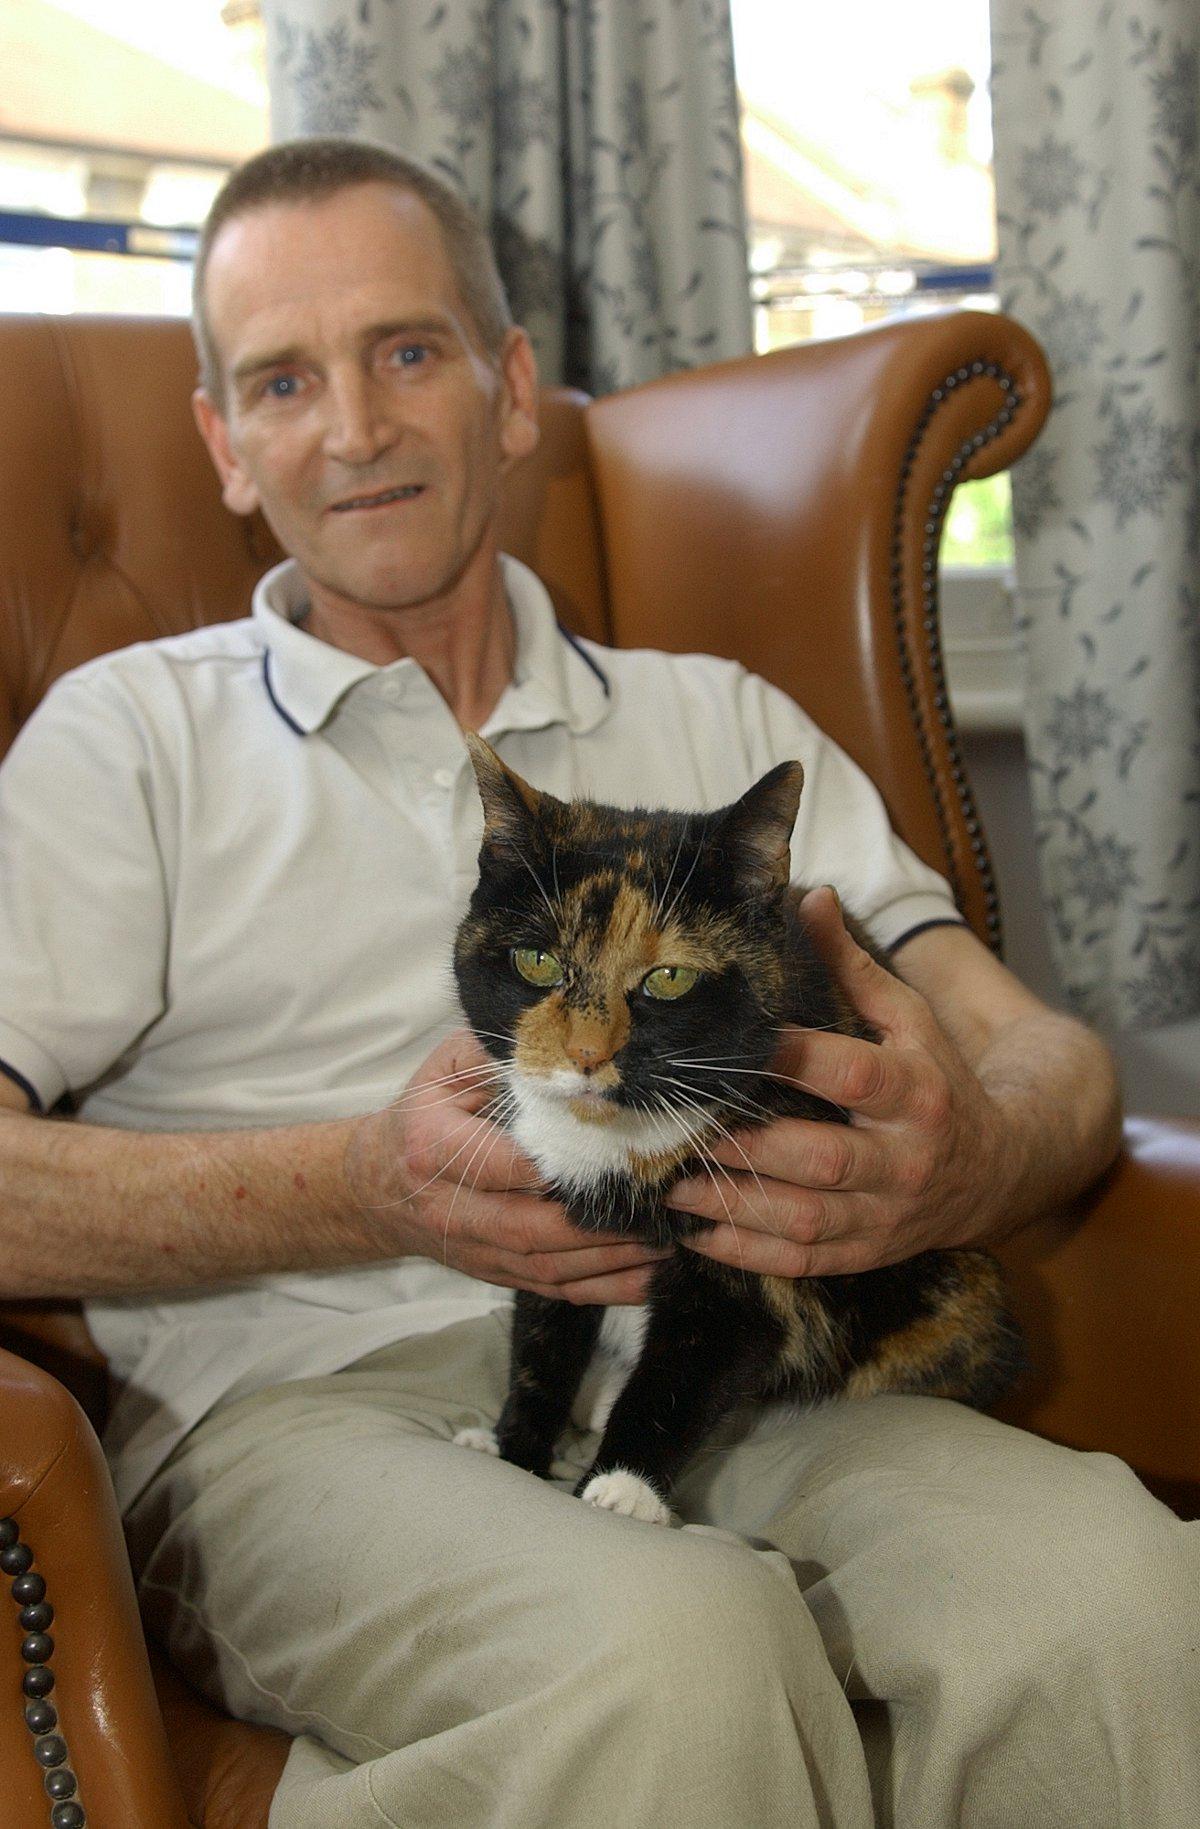 ... News Shopper: Anthony Schofield with rescue cat Jessie - 2530935